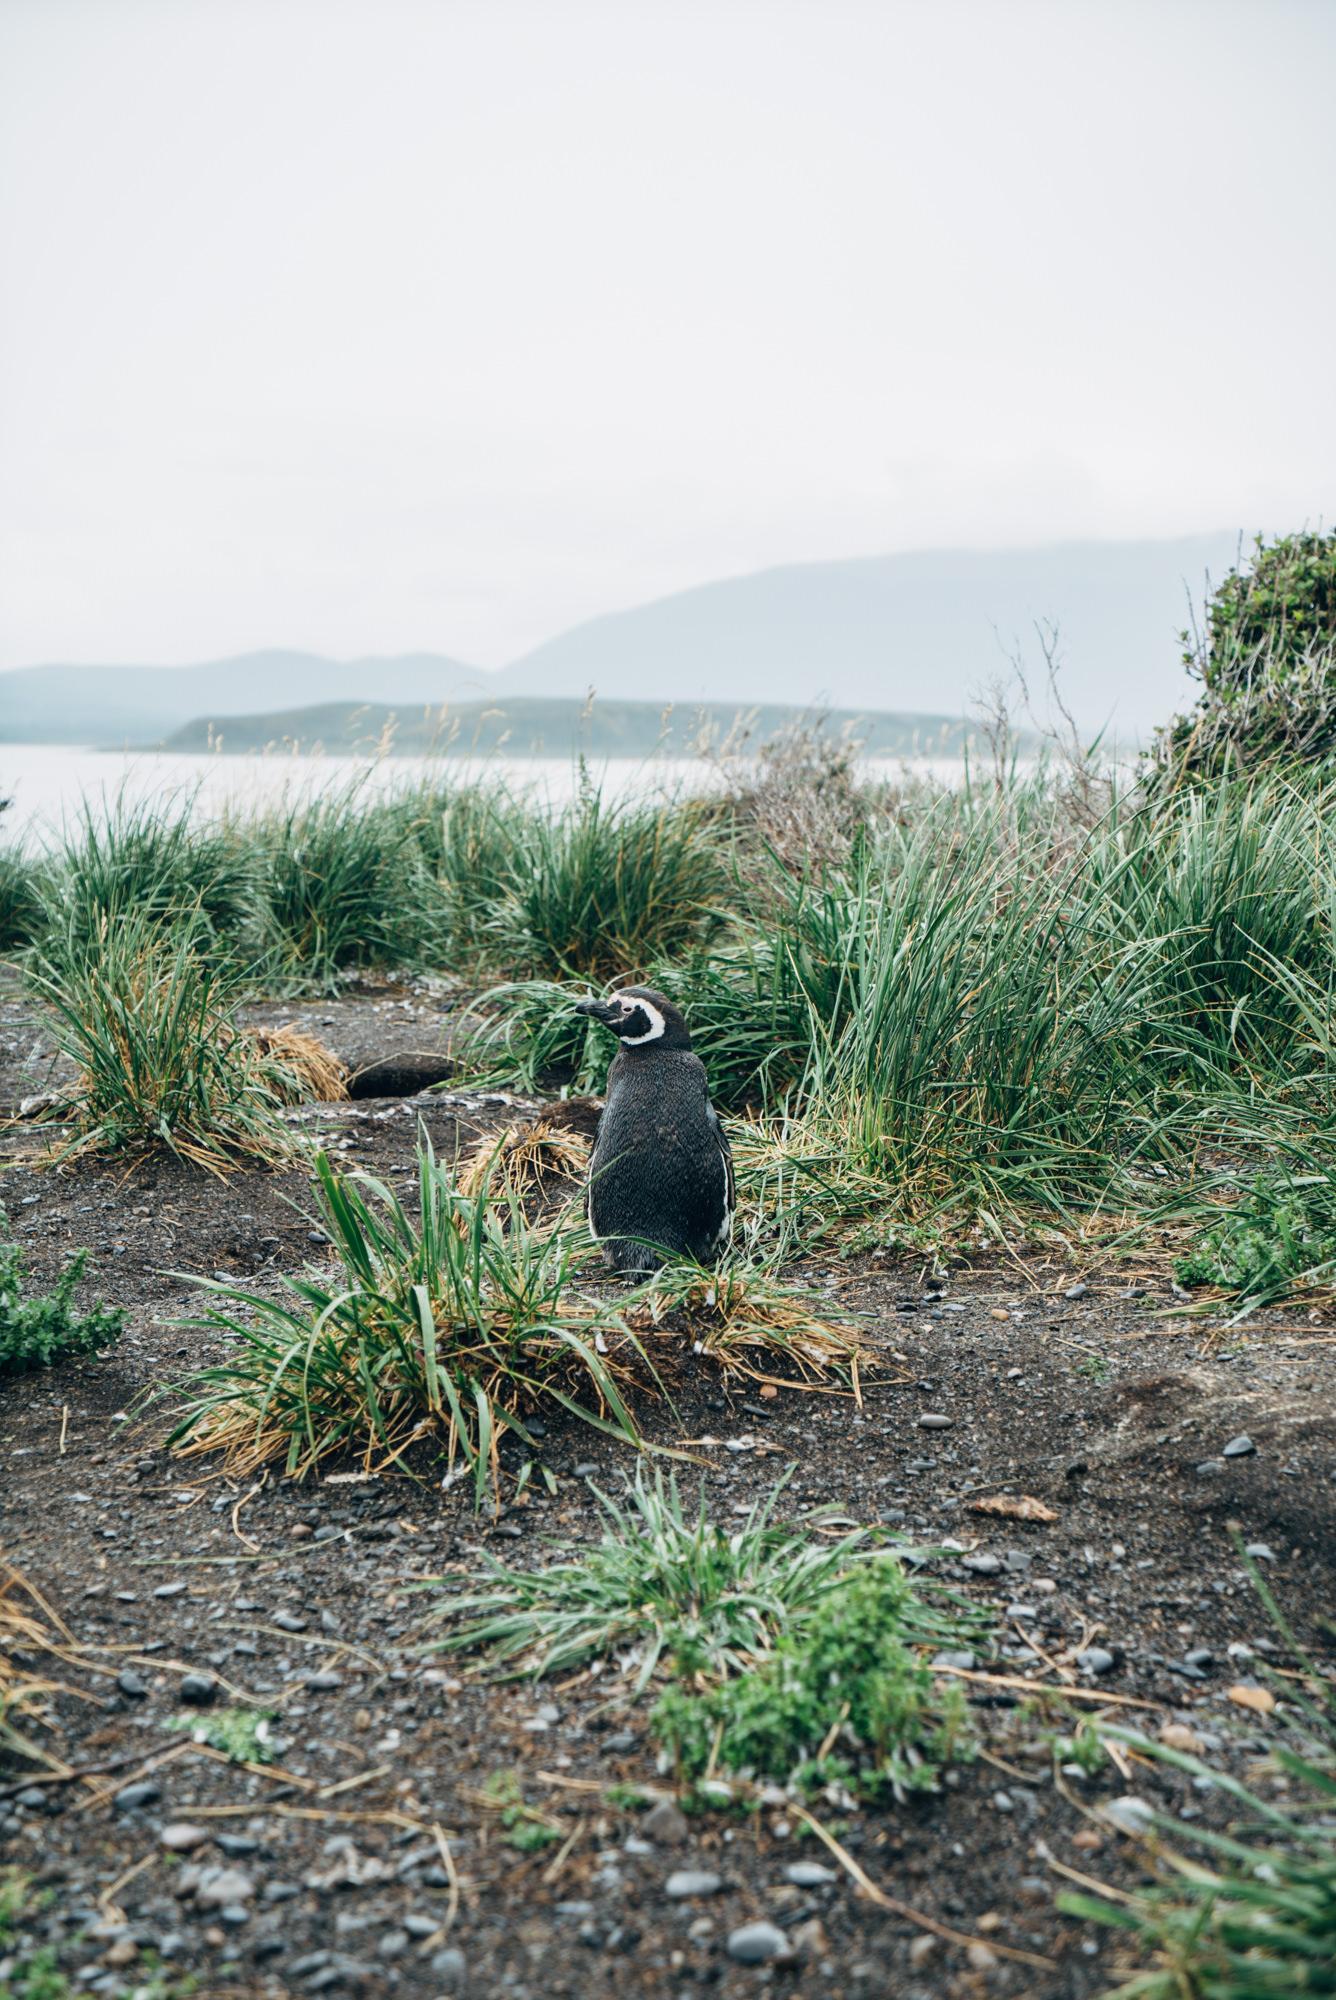 wrenee-ushuaia-argentina-23.jpg